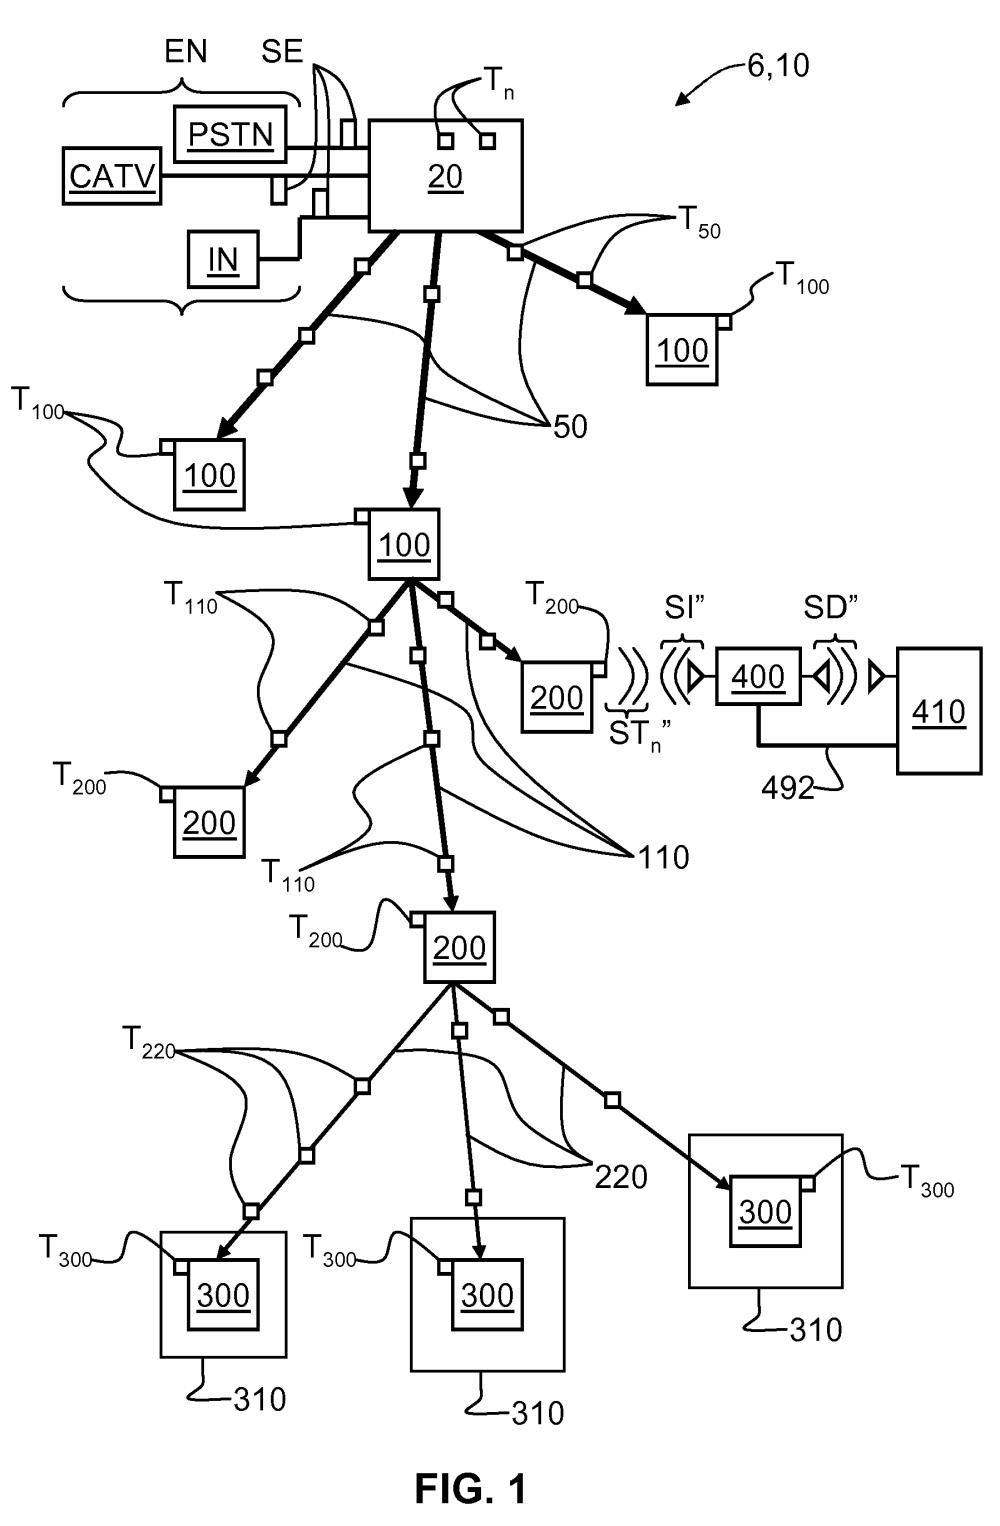 medium resolution of diagram free download wiring schematic on dsl splitter diagram free engine image for user setup at t u verse home diagram u verse internet